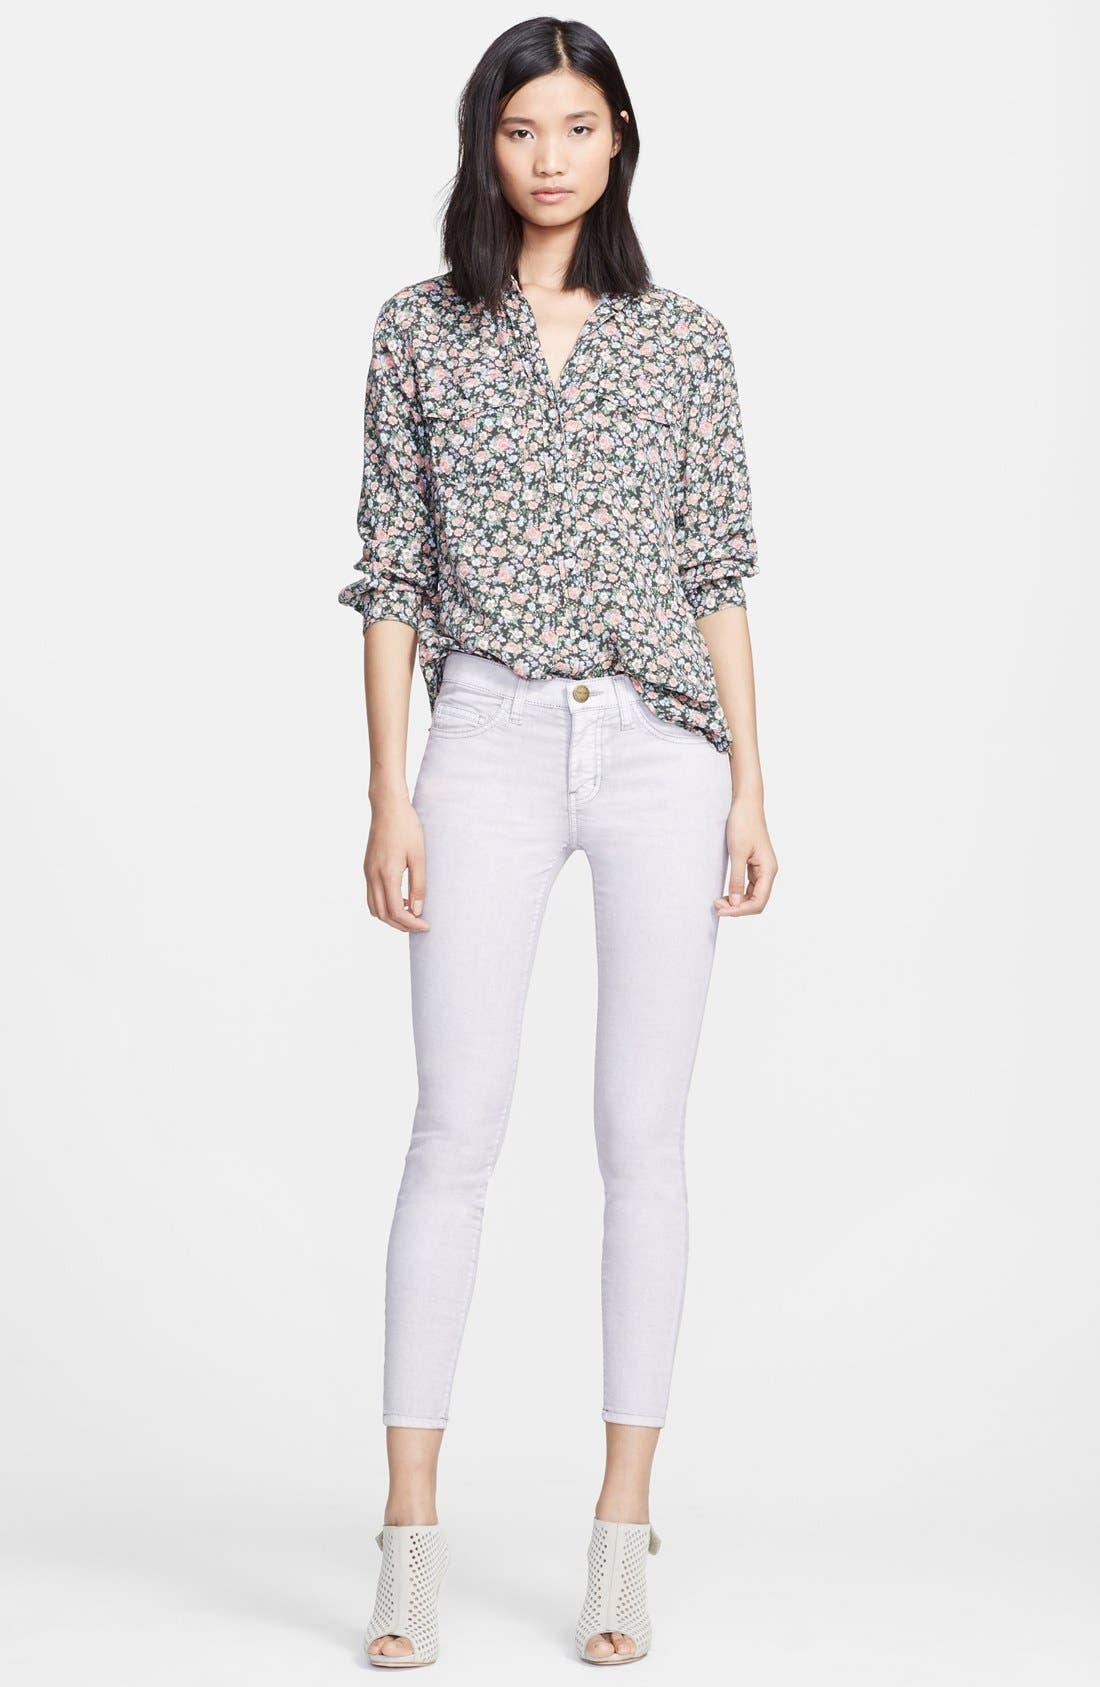 Main Image - Current/Elliott 'The Perfect Shirt' Floral Print Shirt